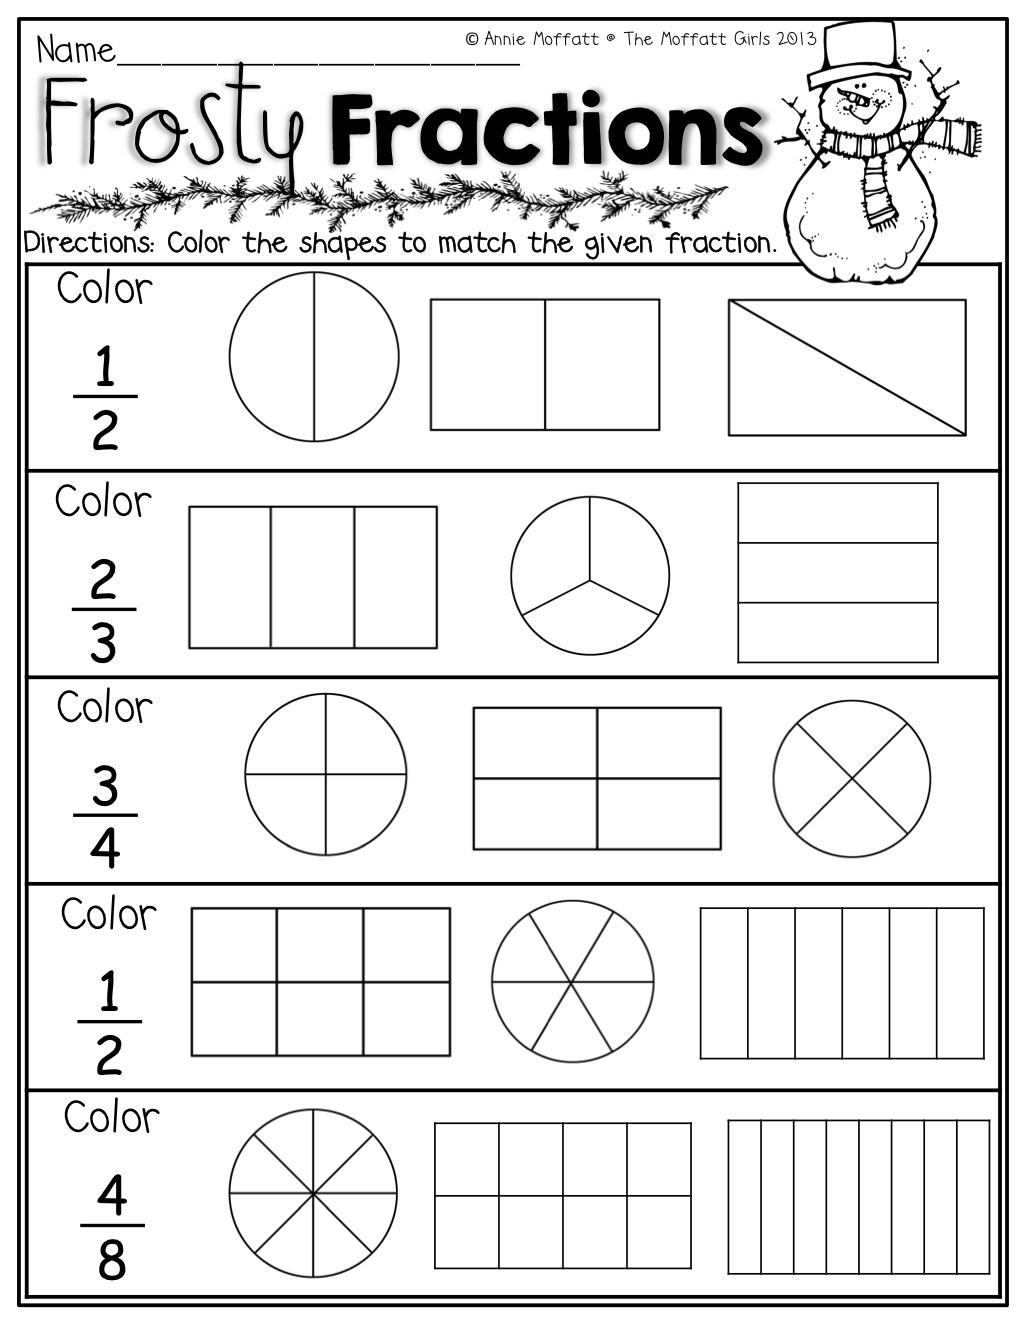 Alphabet Phonics Headbands | École, Mathématiques et ...